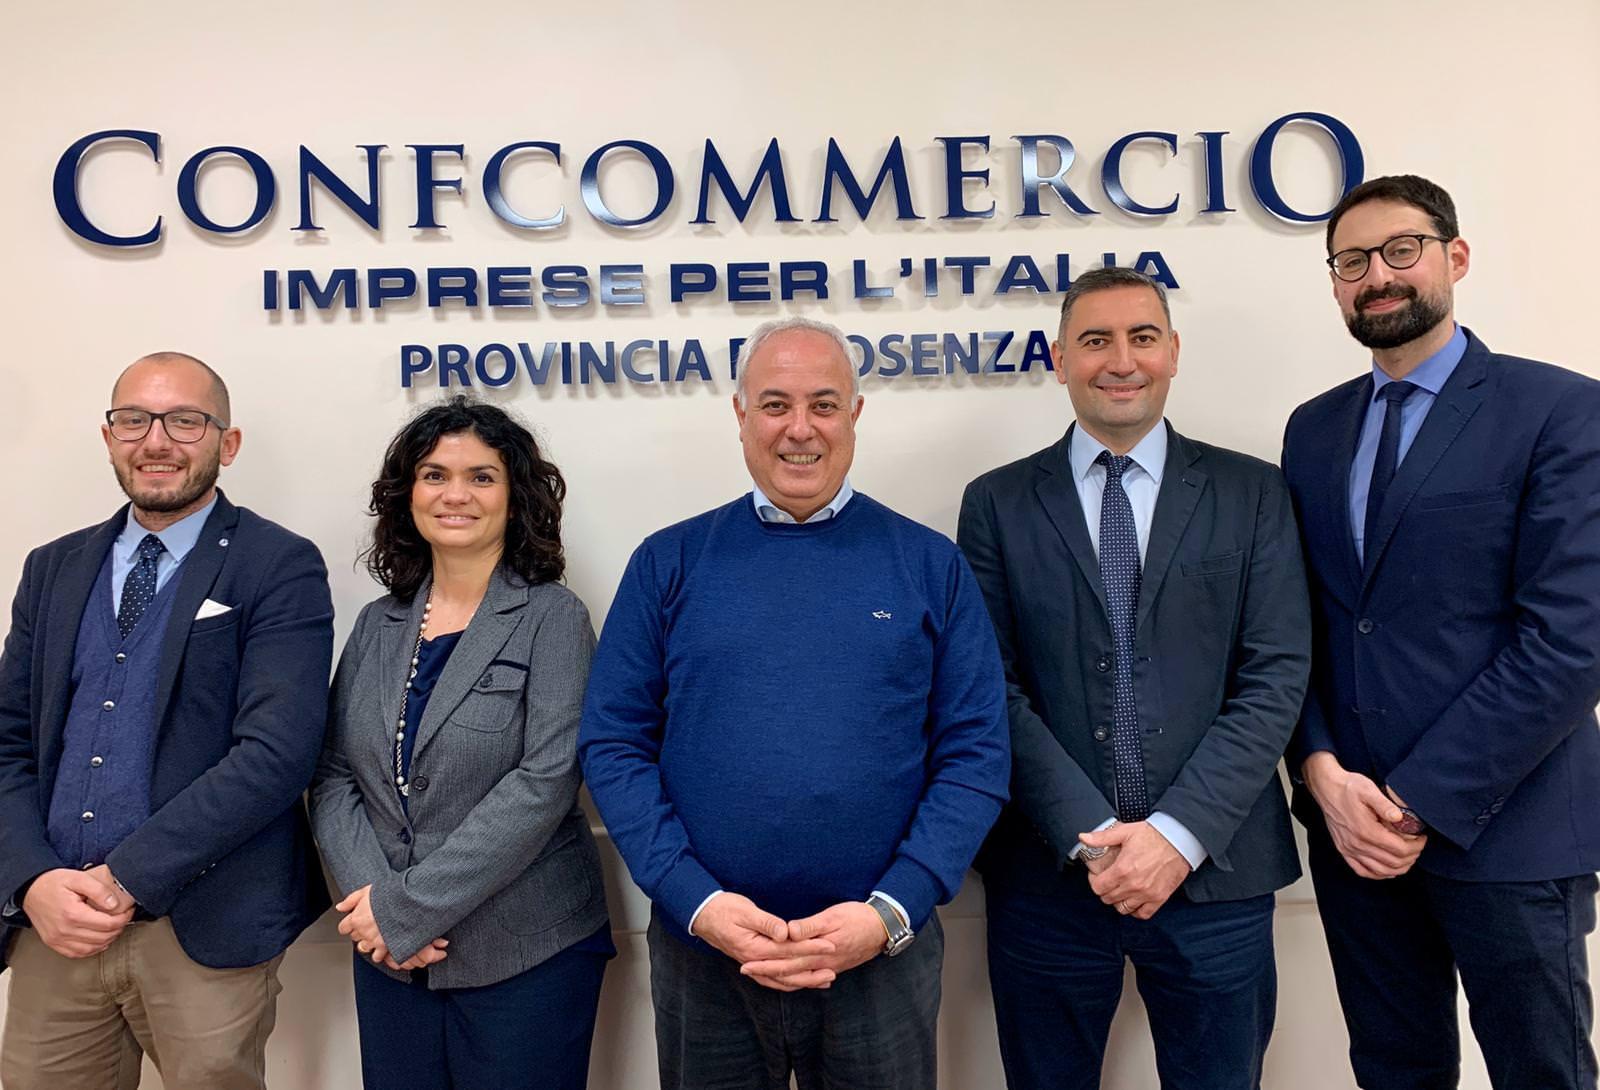 Confcommercio-Cosenza